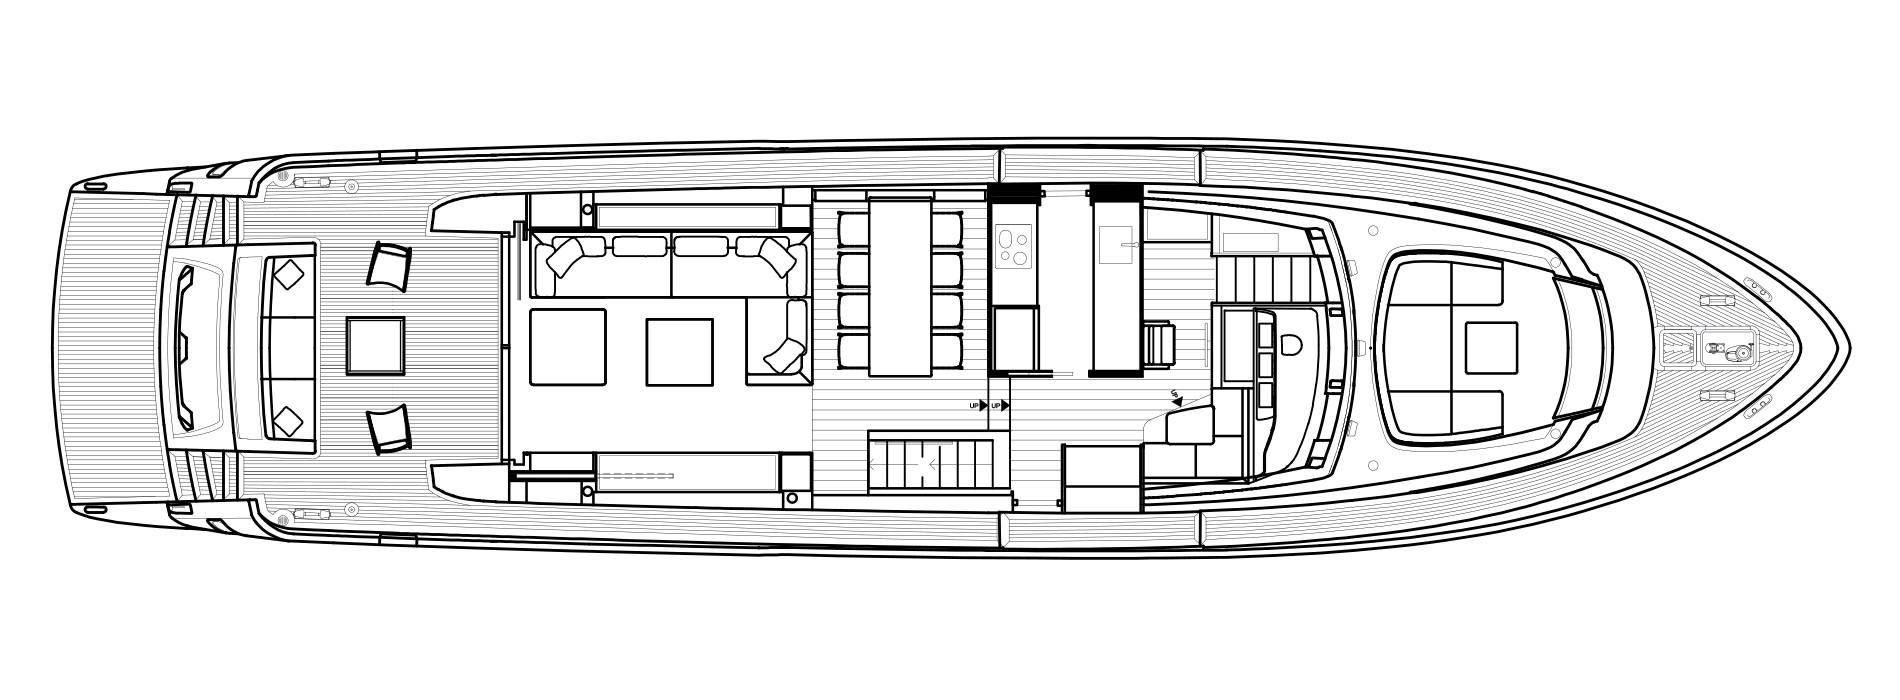 Sanlorenzo Yachts SL78 Cubierta principal